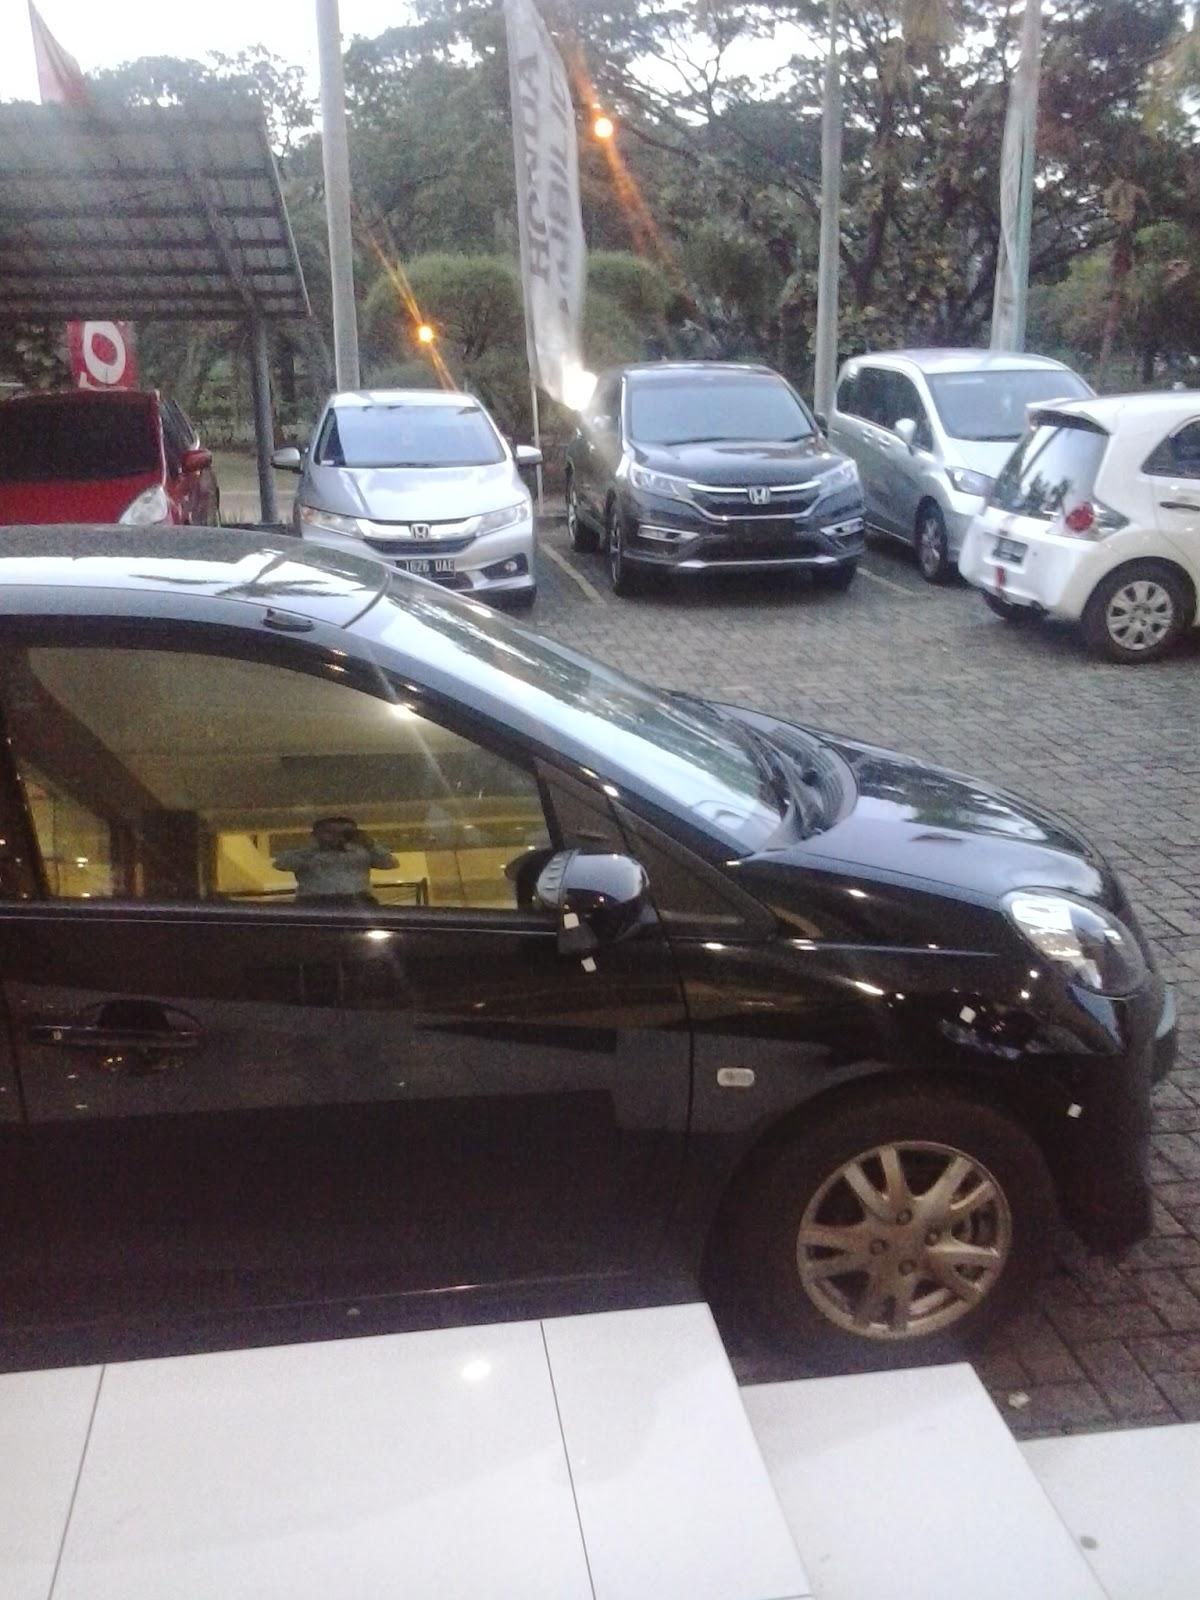 Honda Serang Baru - dealer Mobil - Sales honda